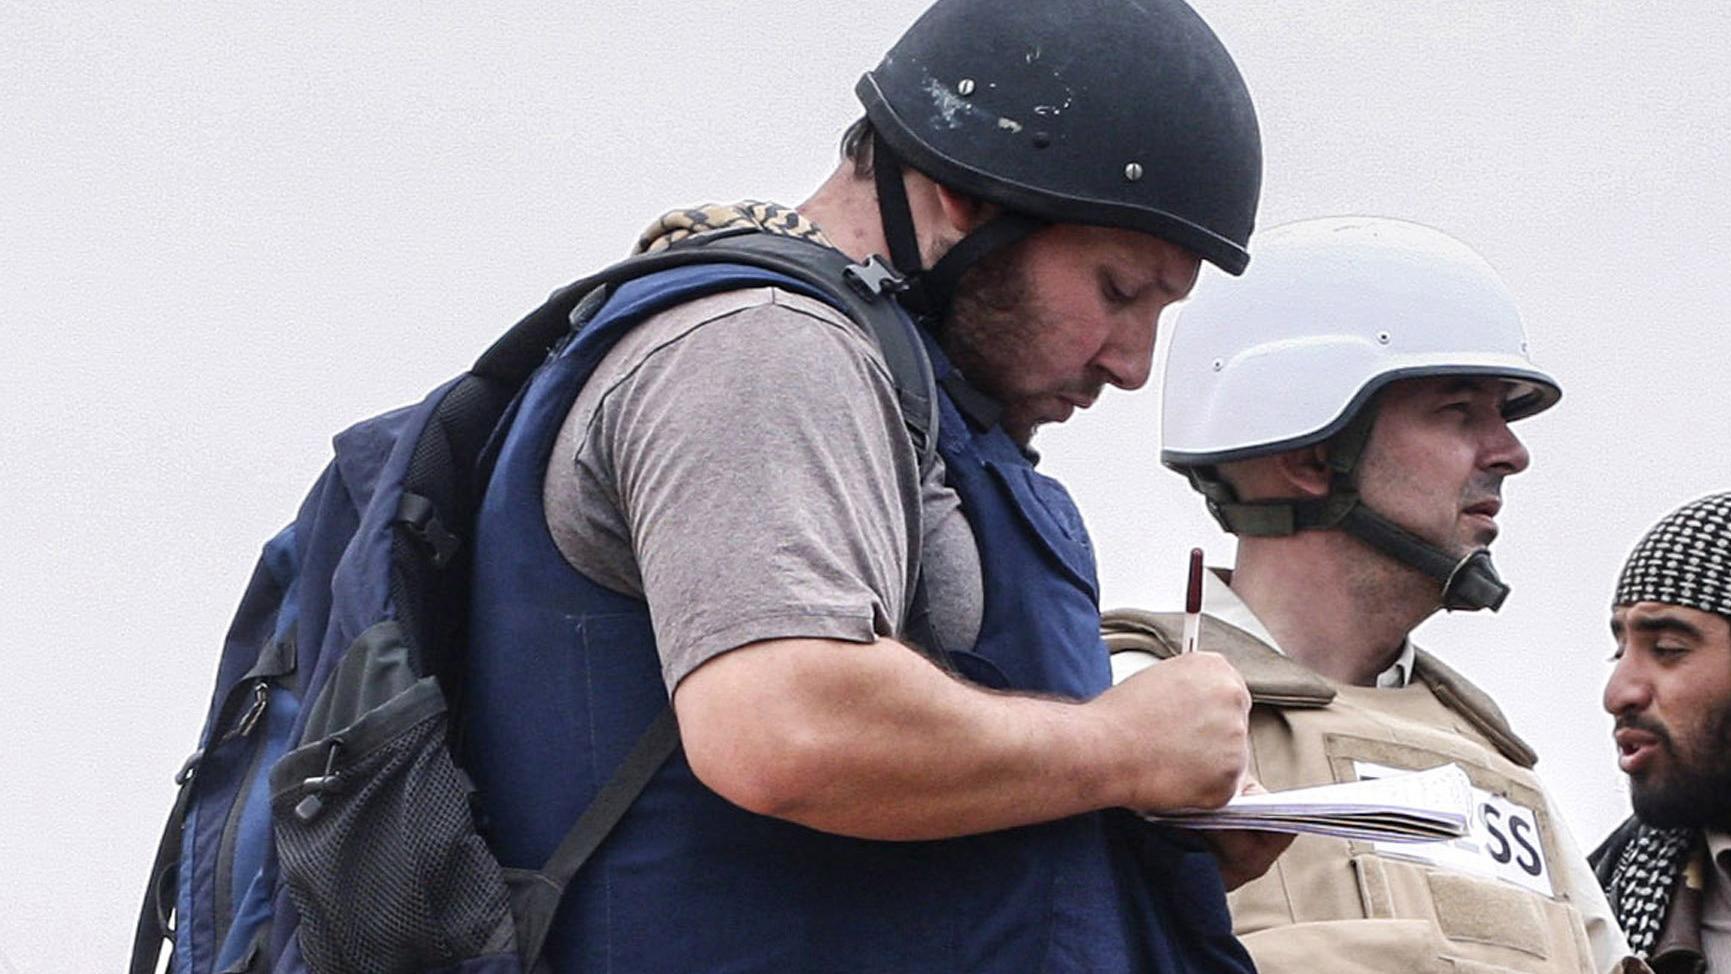 Dangerous hotspots for journalists